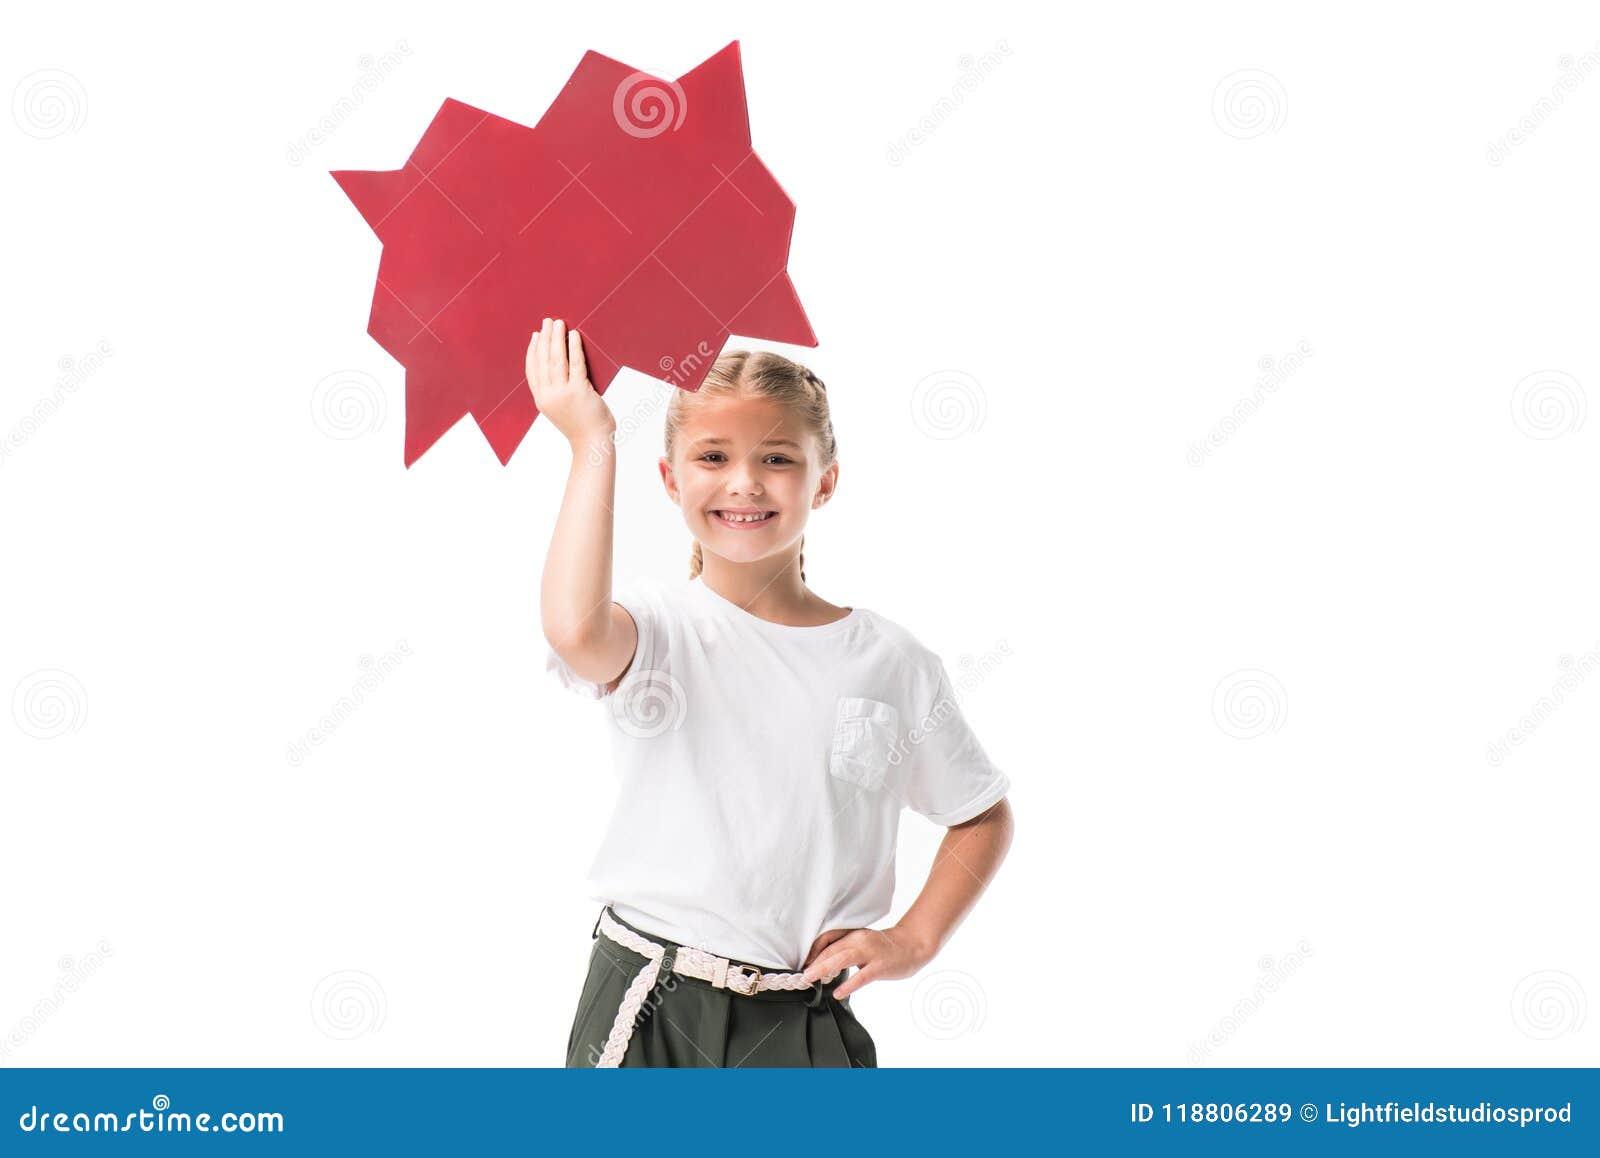 cheerful blonde girl holding blank speech bubble